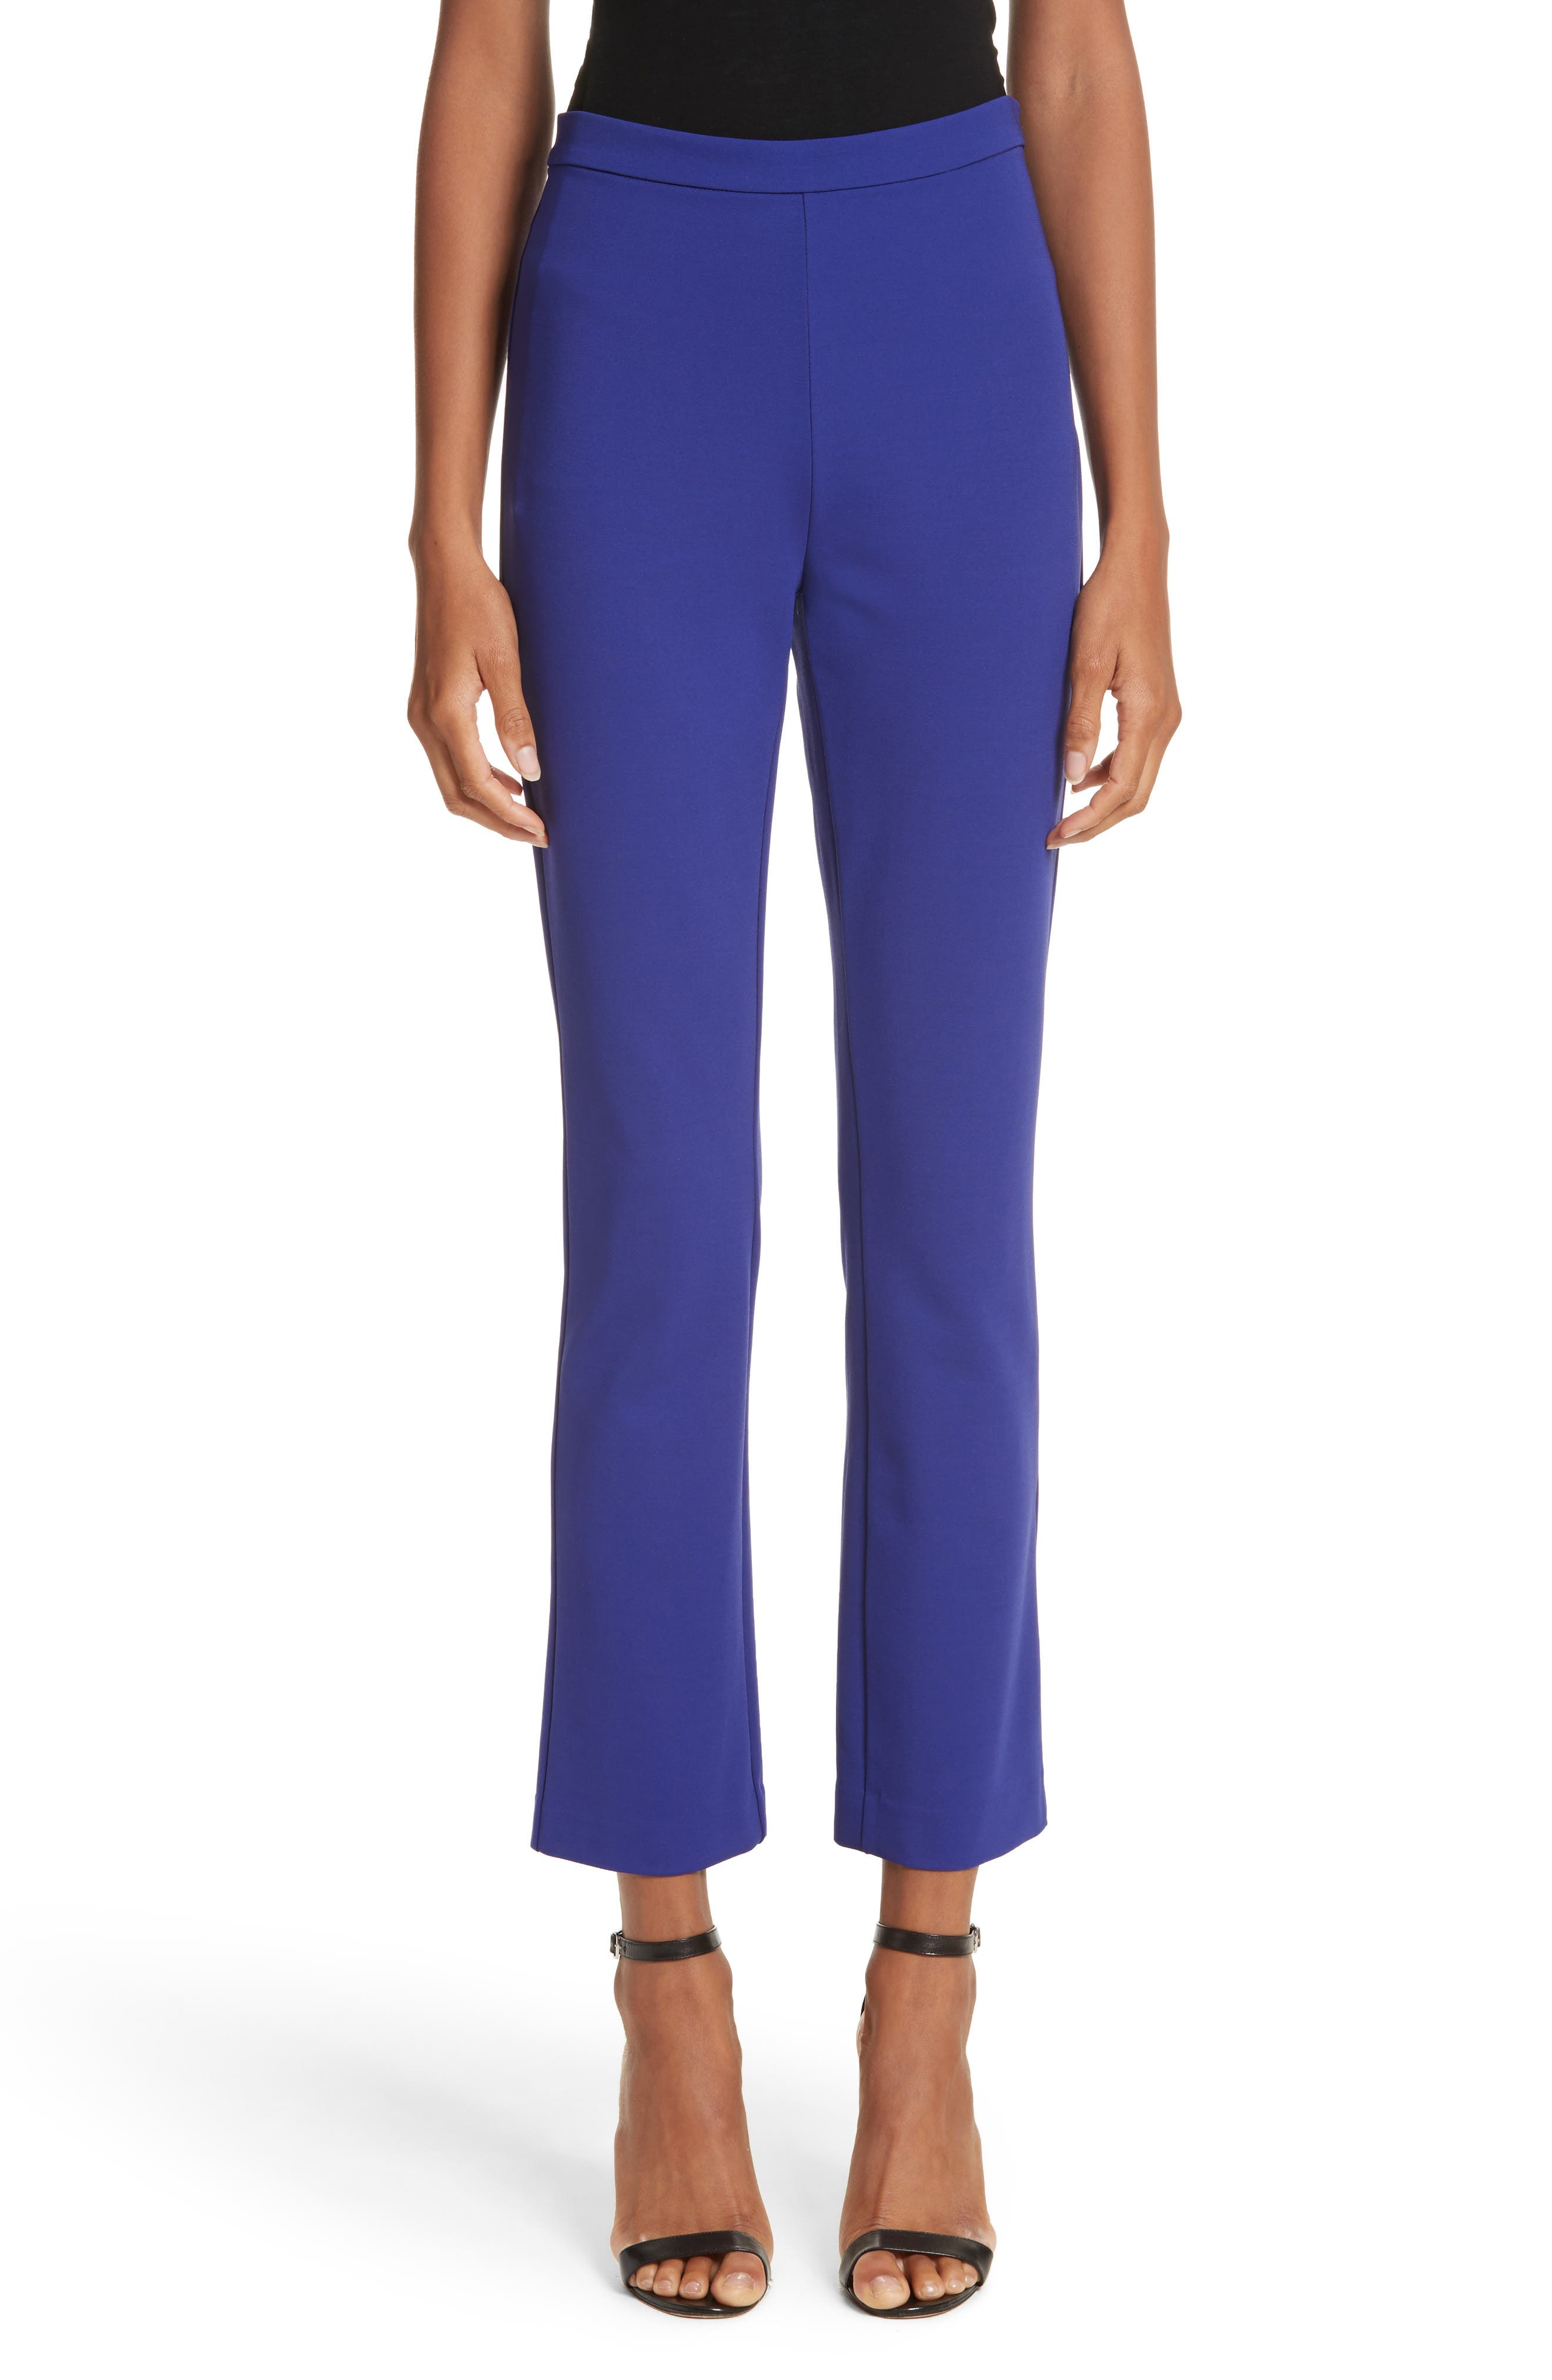 Calerno Crepe Crop Trousers,                             Main thumbnail 1, color,                             Violet